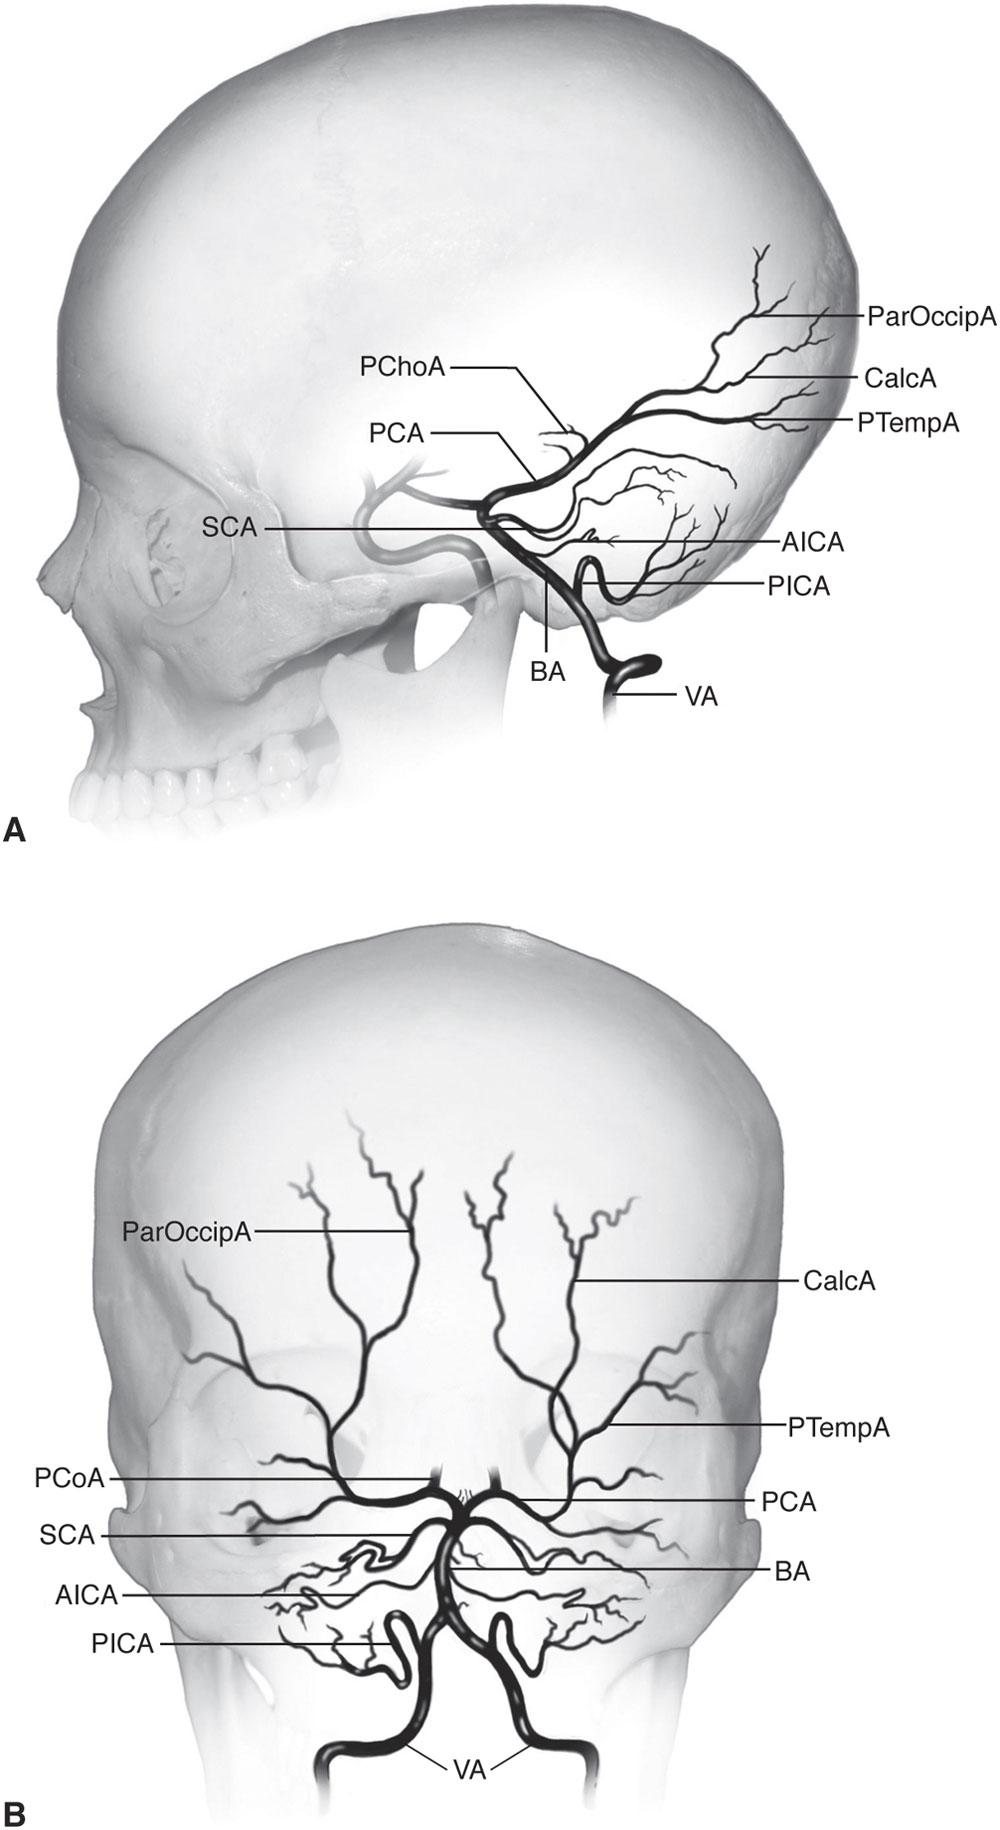 Chapter 1: Neuro-Ophthalmic Anatomy | Ento Key